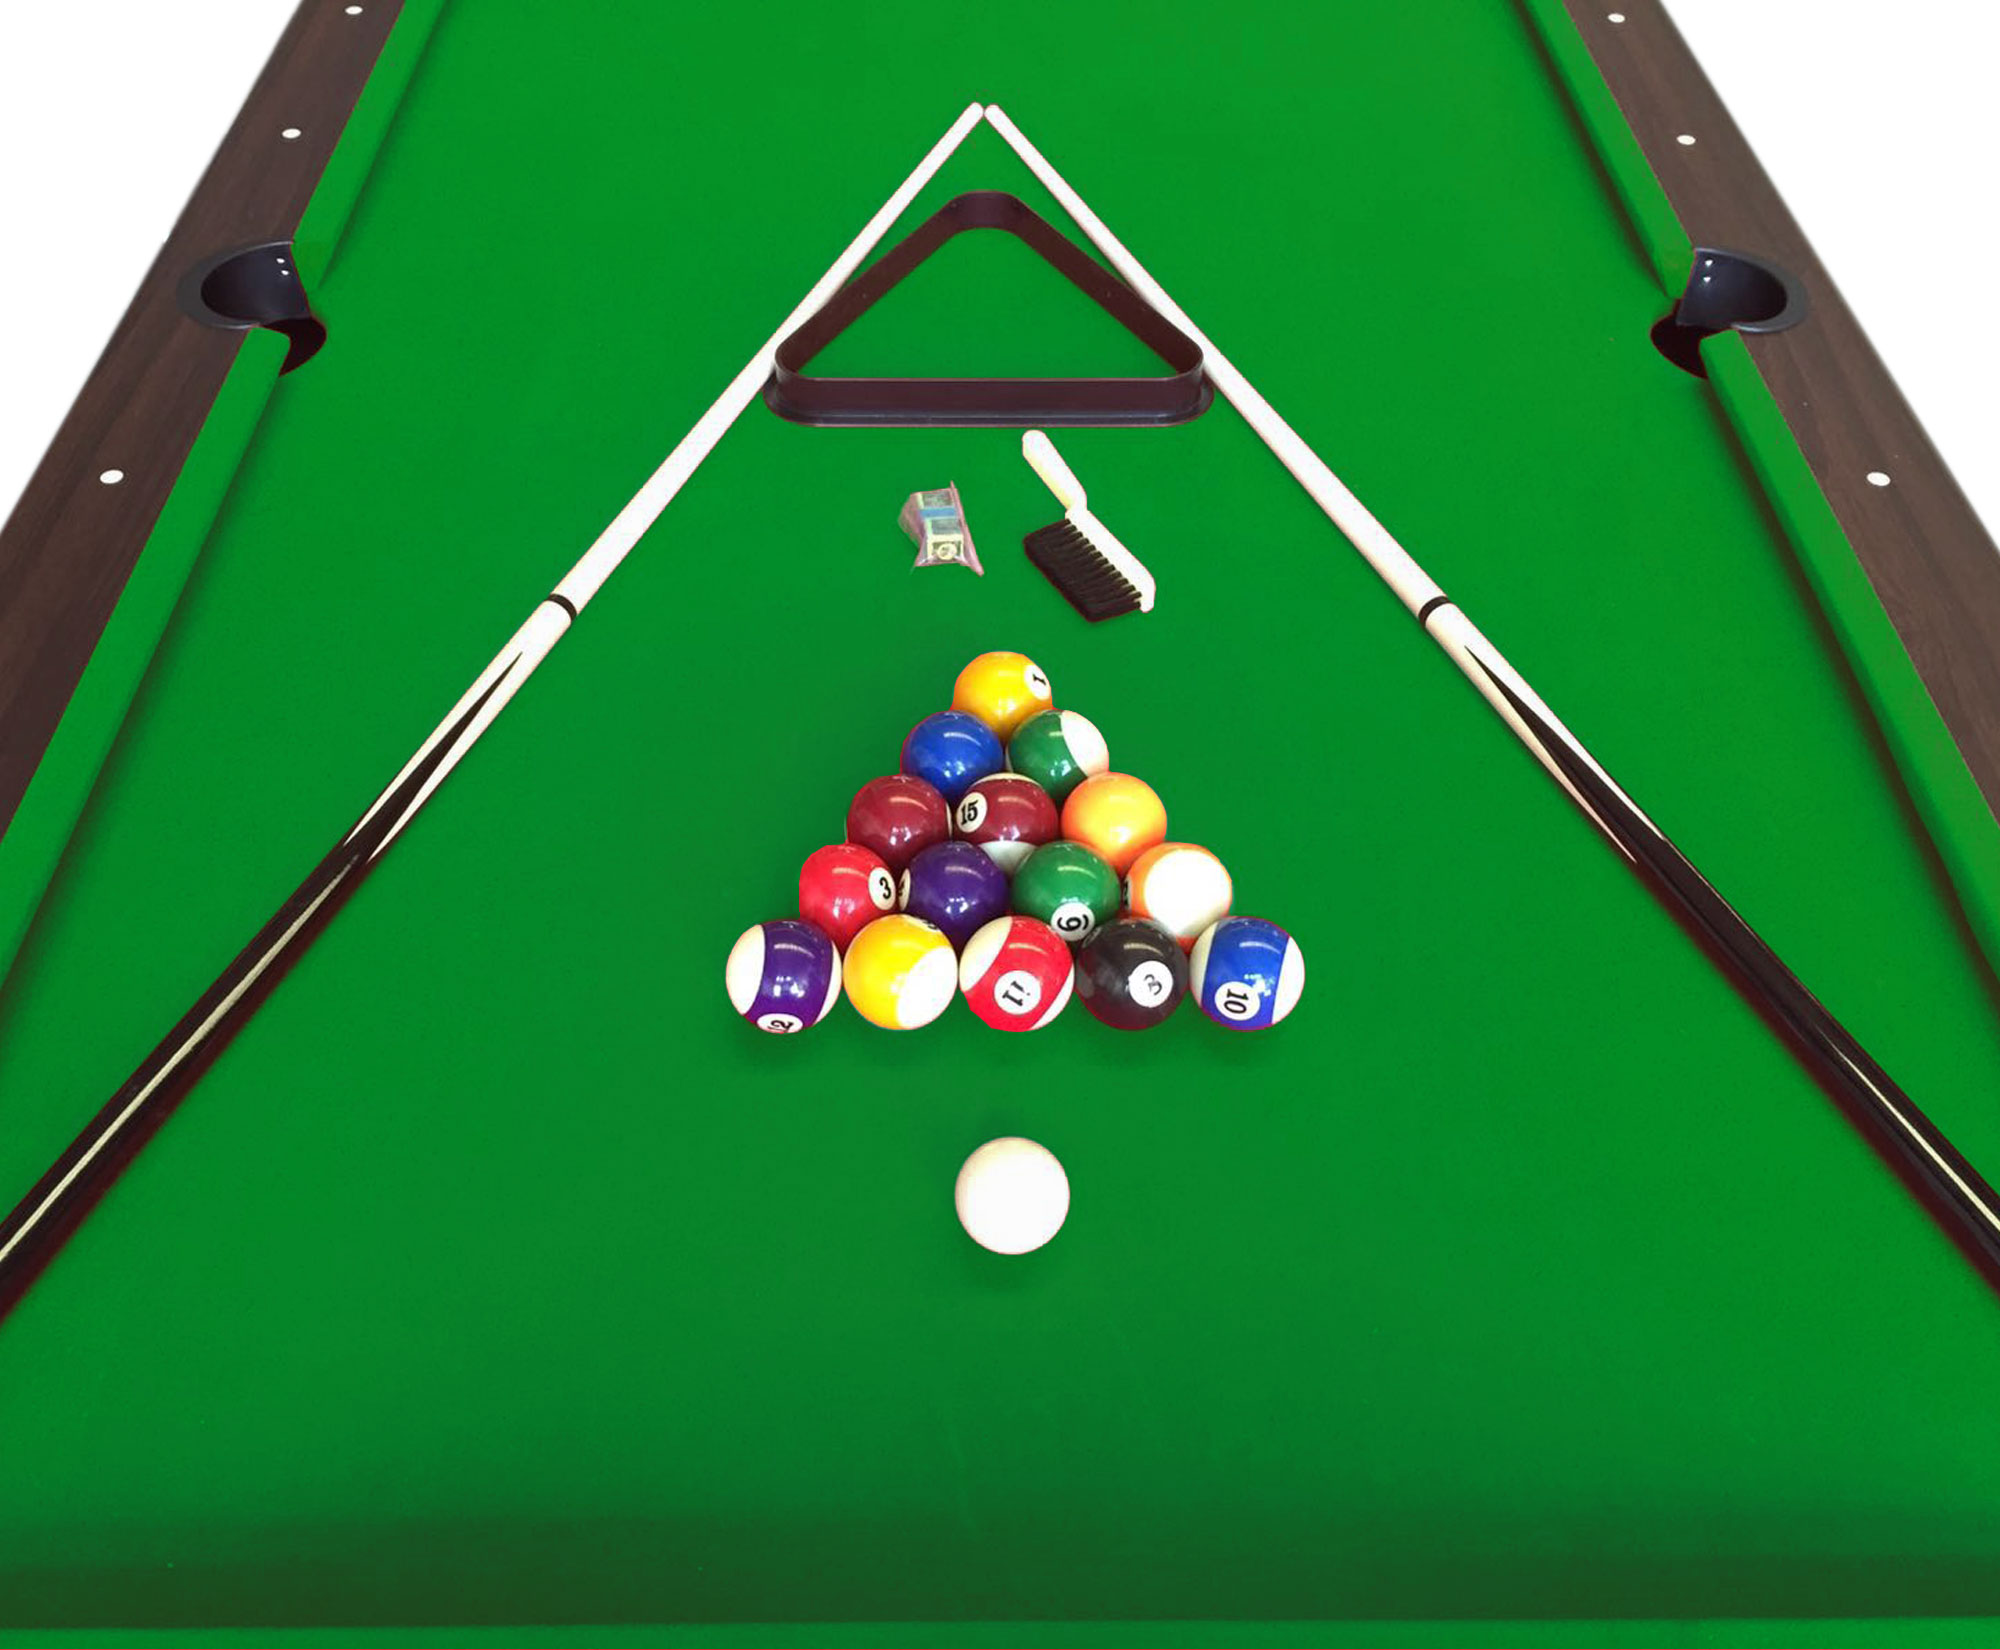 Tavolo da biliardo carambola misura 220 x 110 cm snooker verde 8 ft leonida ebay - Misure tavolo da biliardo ...